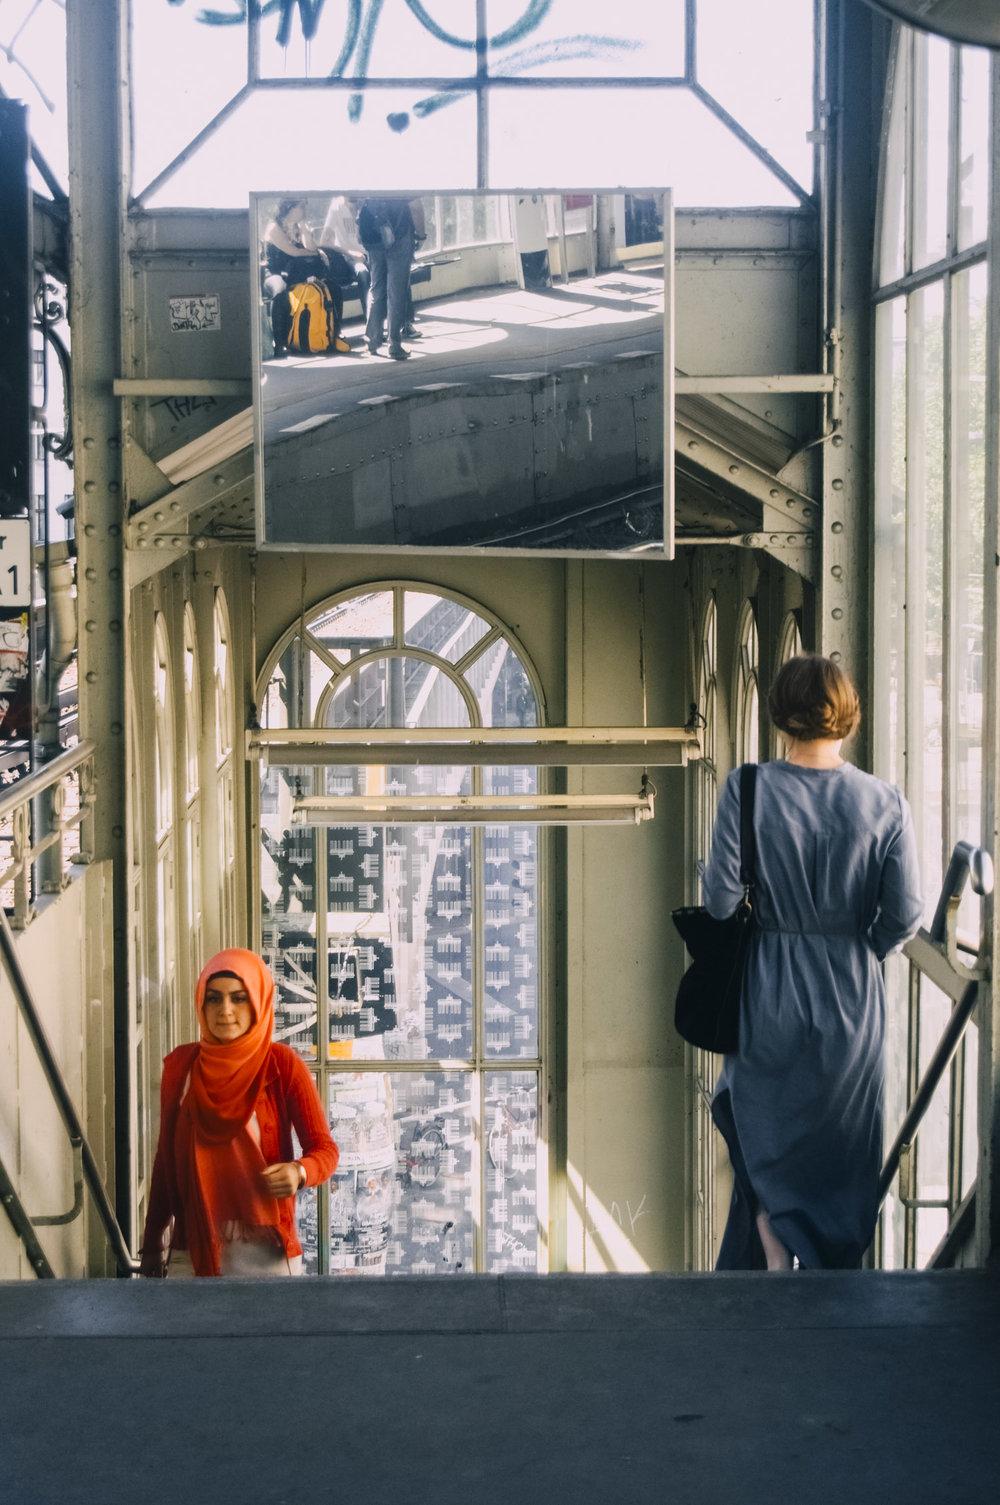 berlin-may-78.jpg